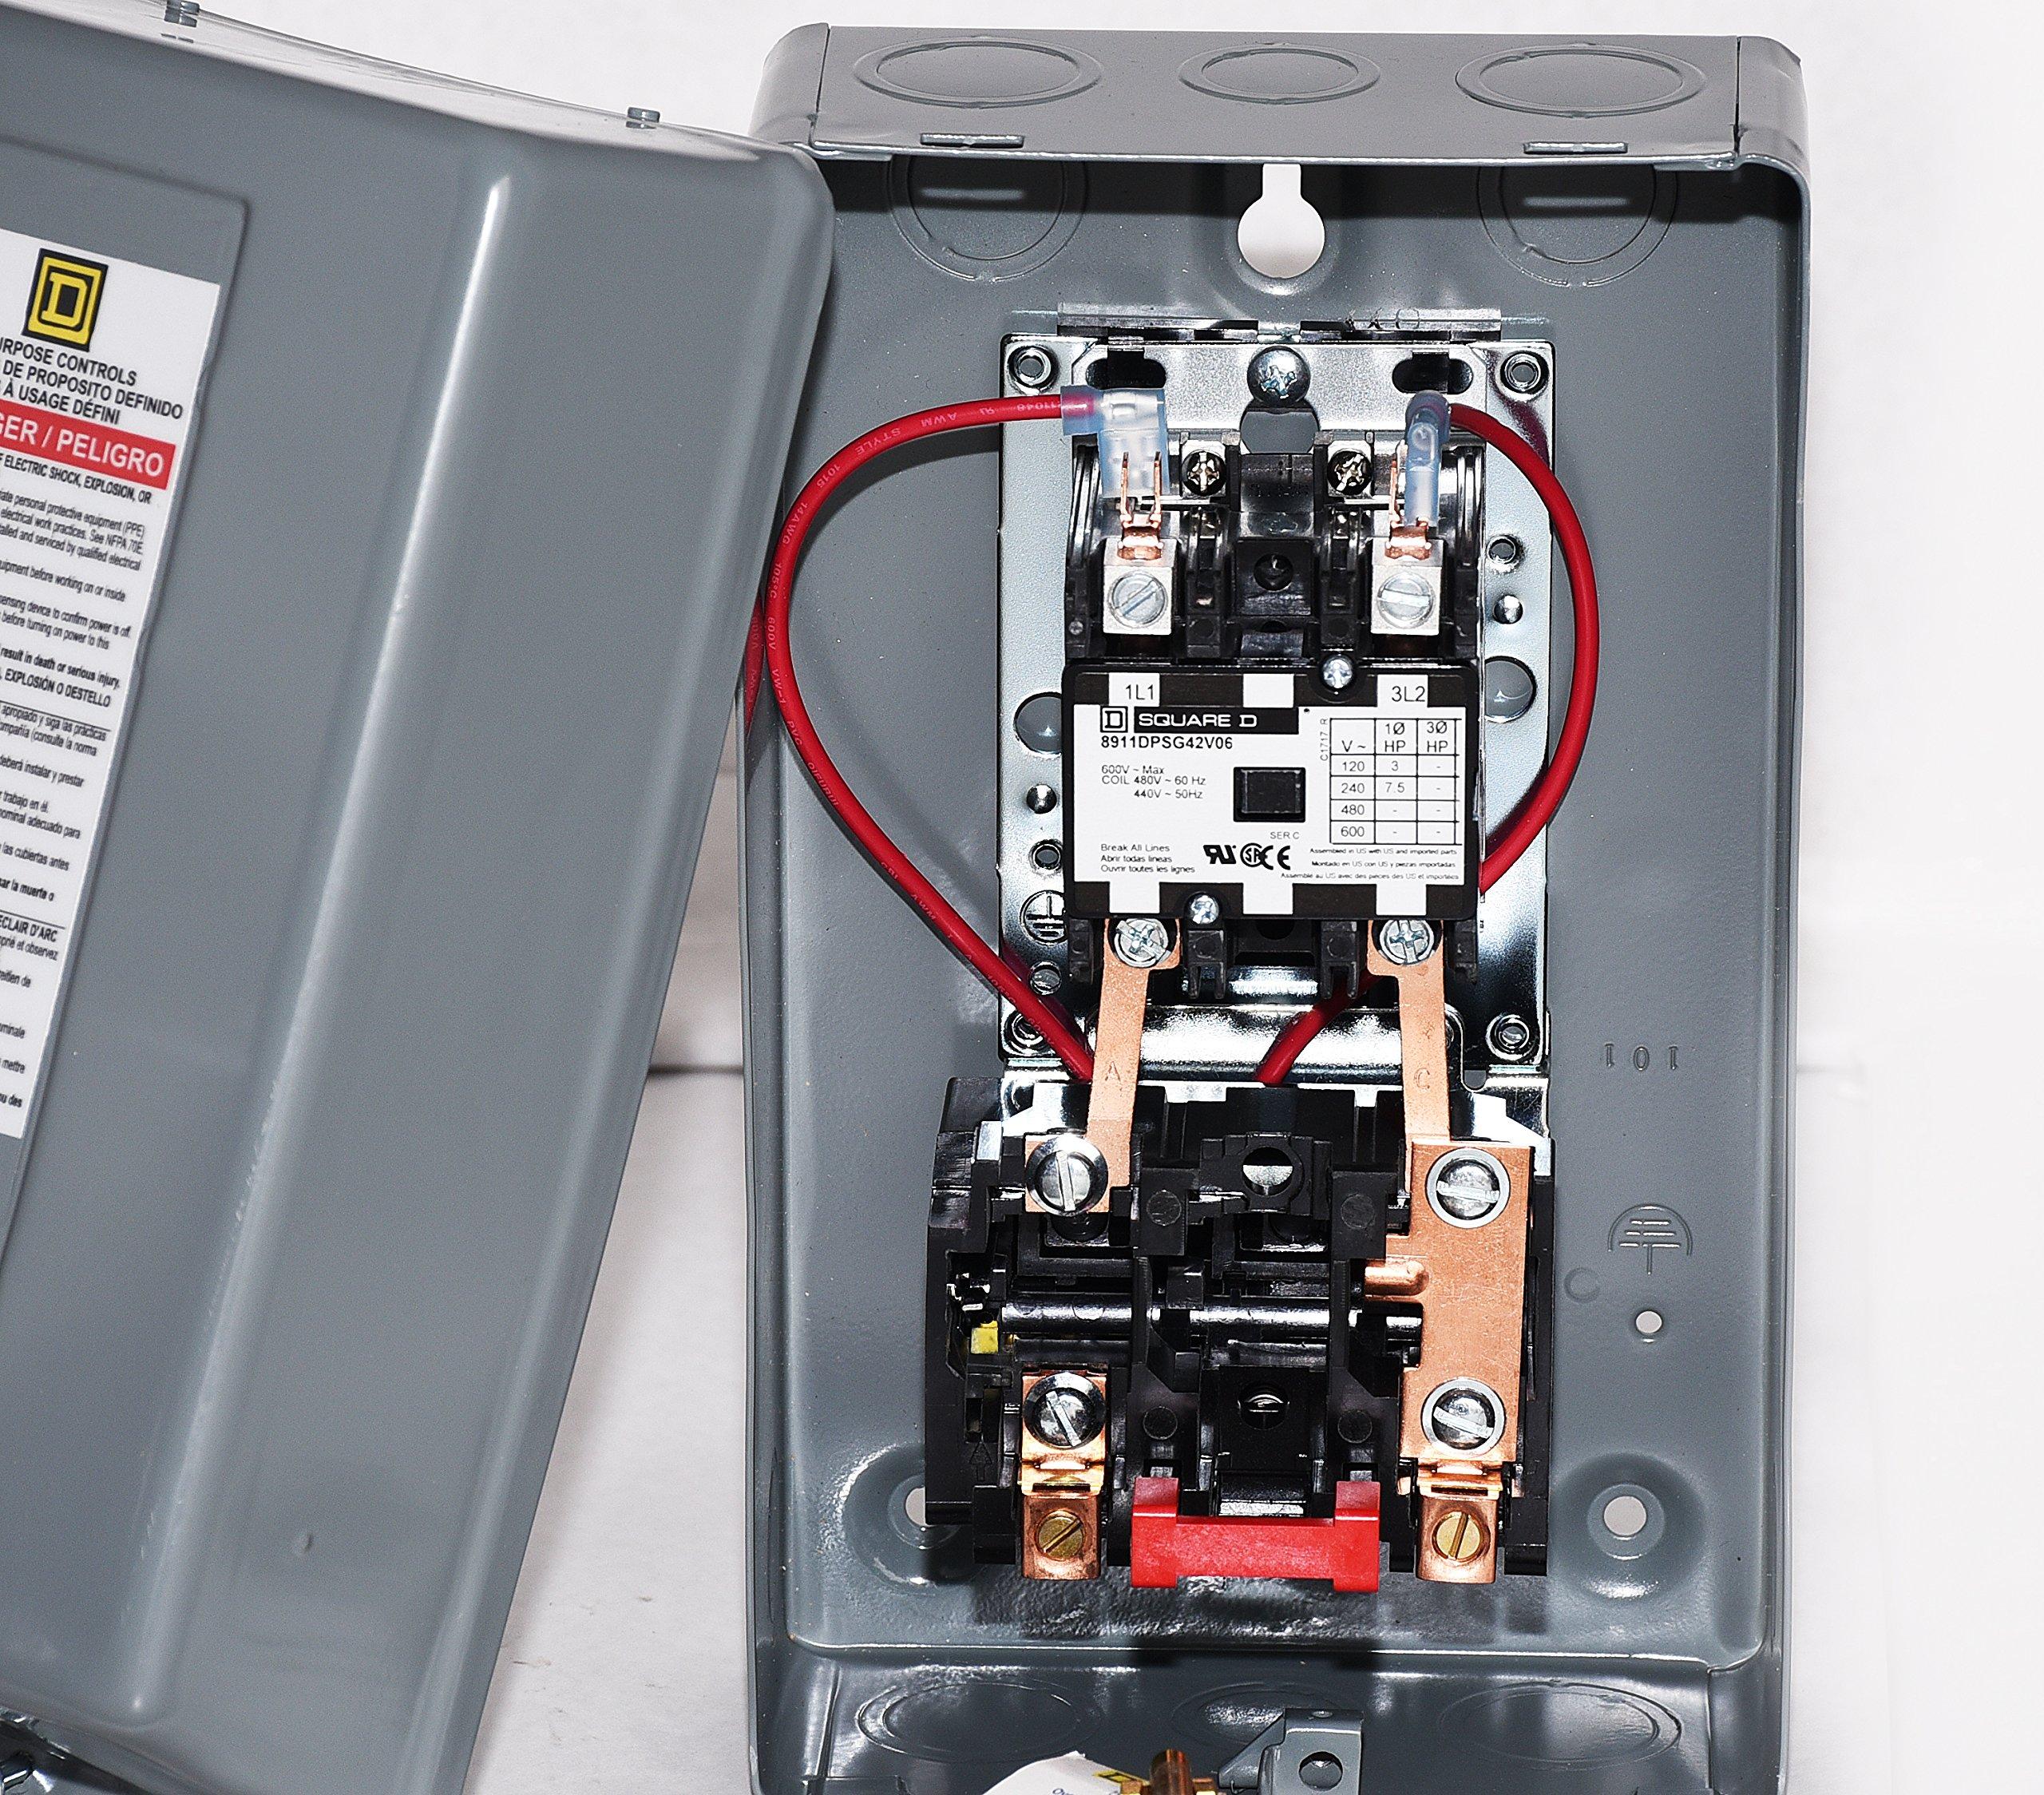 SQUARE D MAGNETIC STARTER CONRTROL ELECTRIC MOTOR 8911DPSG42V09 7.5HP 1-PH 230V by I.E.E (Image #4)